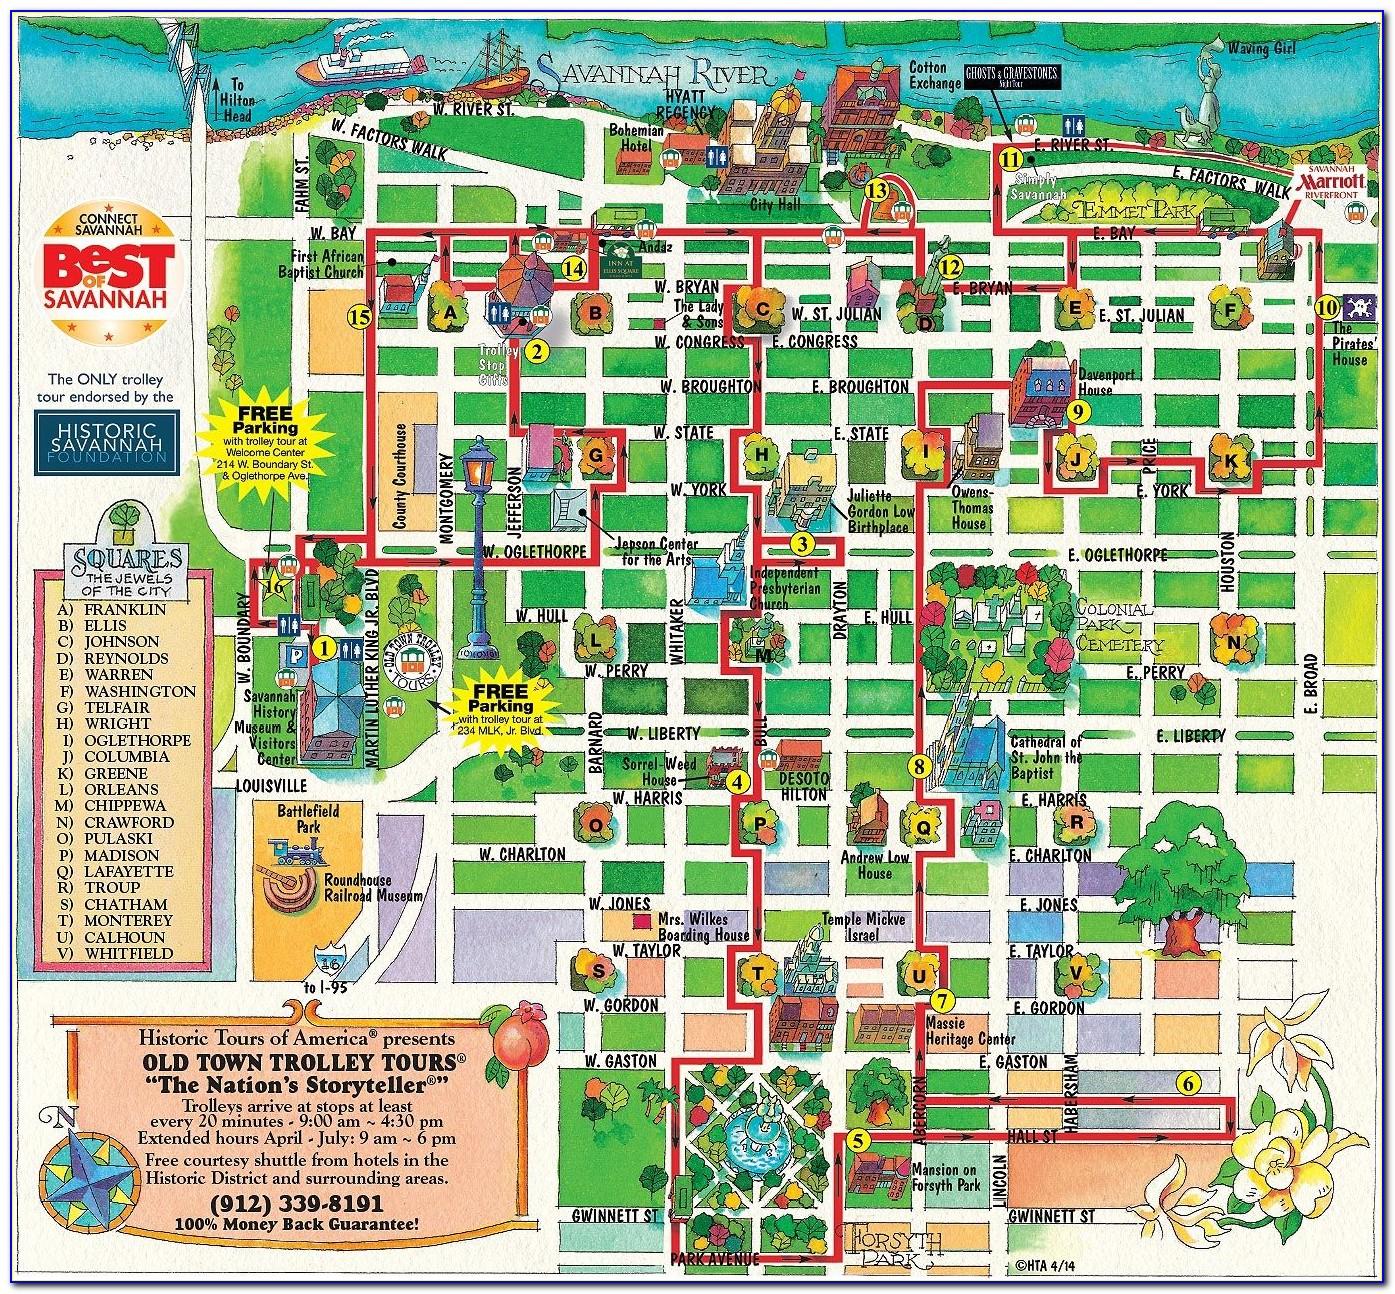 Map Of Marriott Hotels In Savannah Ga